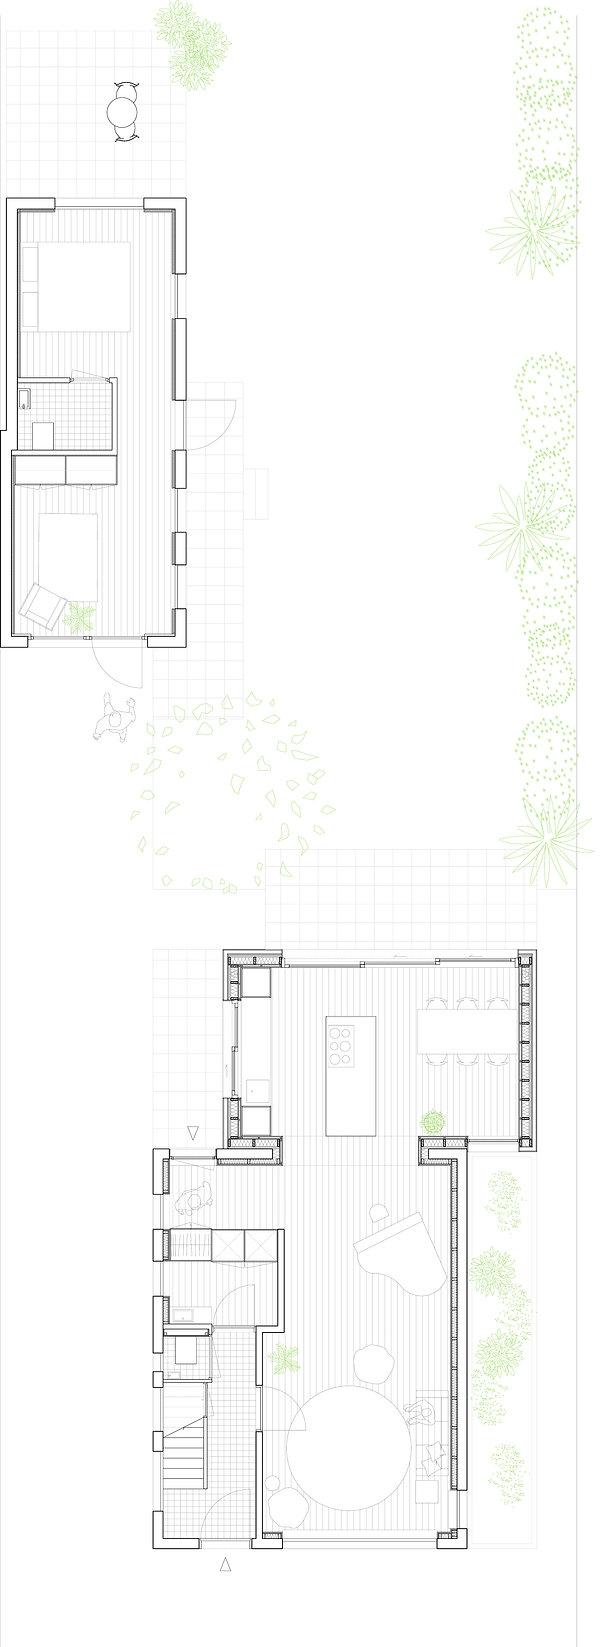 Kevin Veenhuizen Architects / Verduurzaming en Aanbouw Limmen / Plattegrond